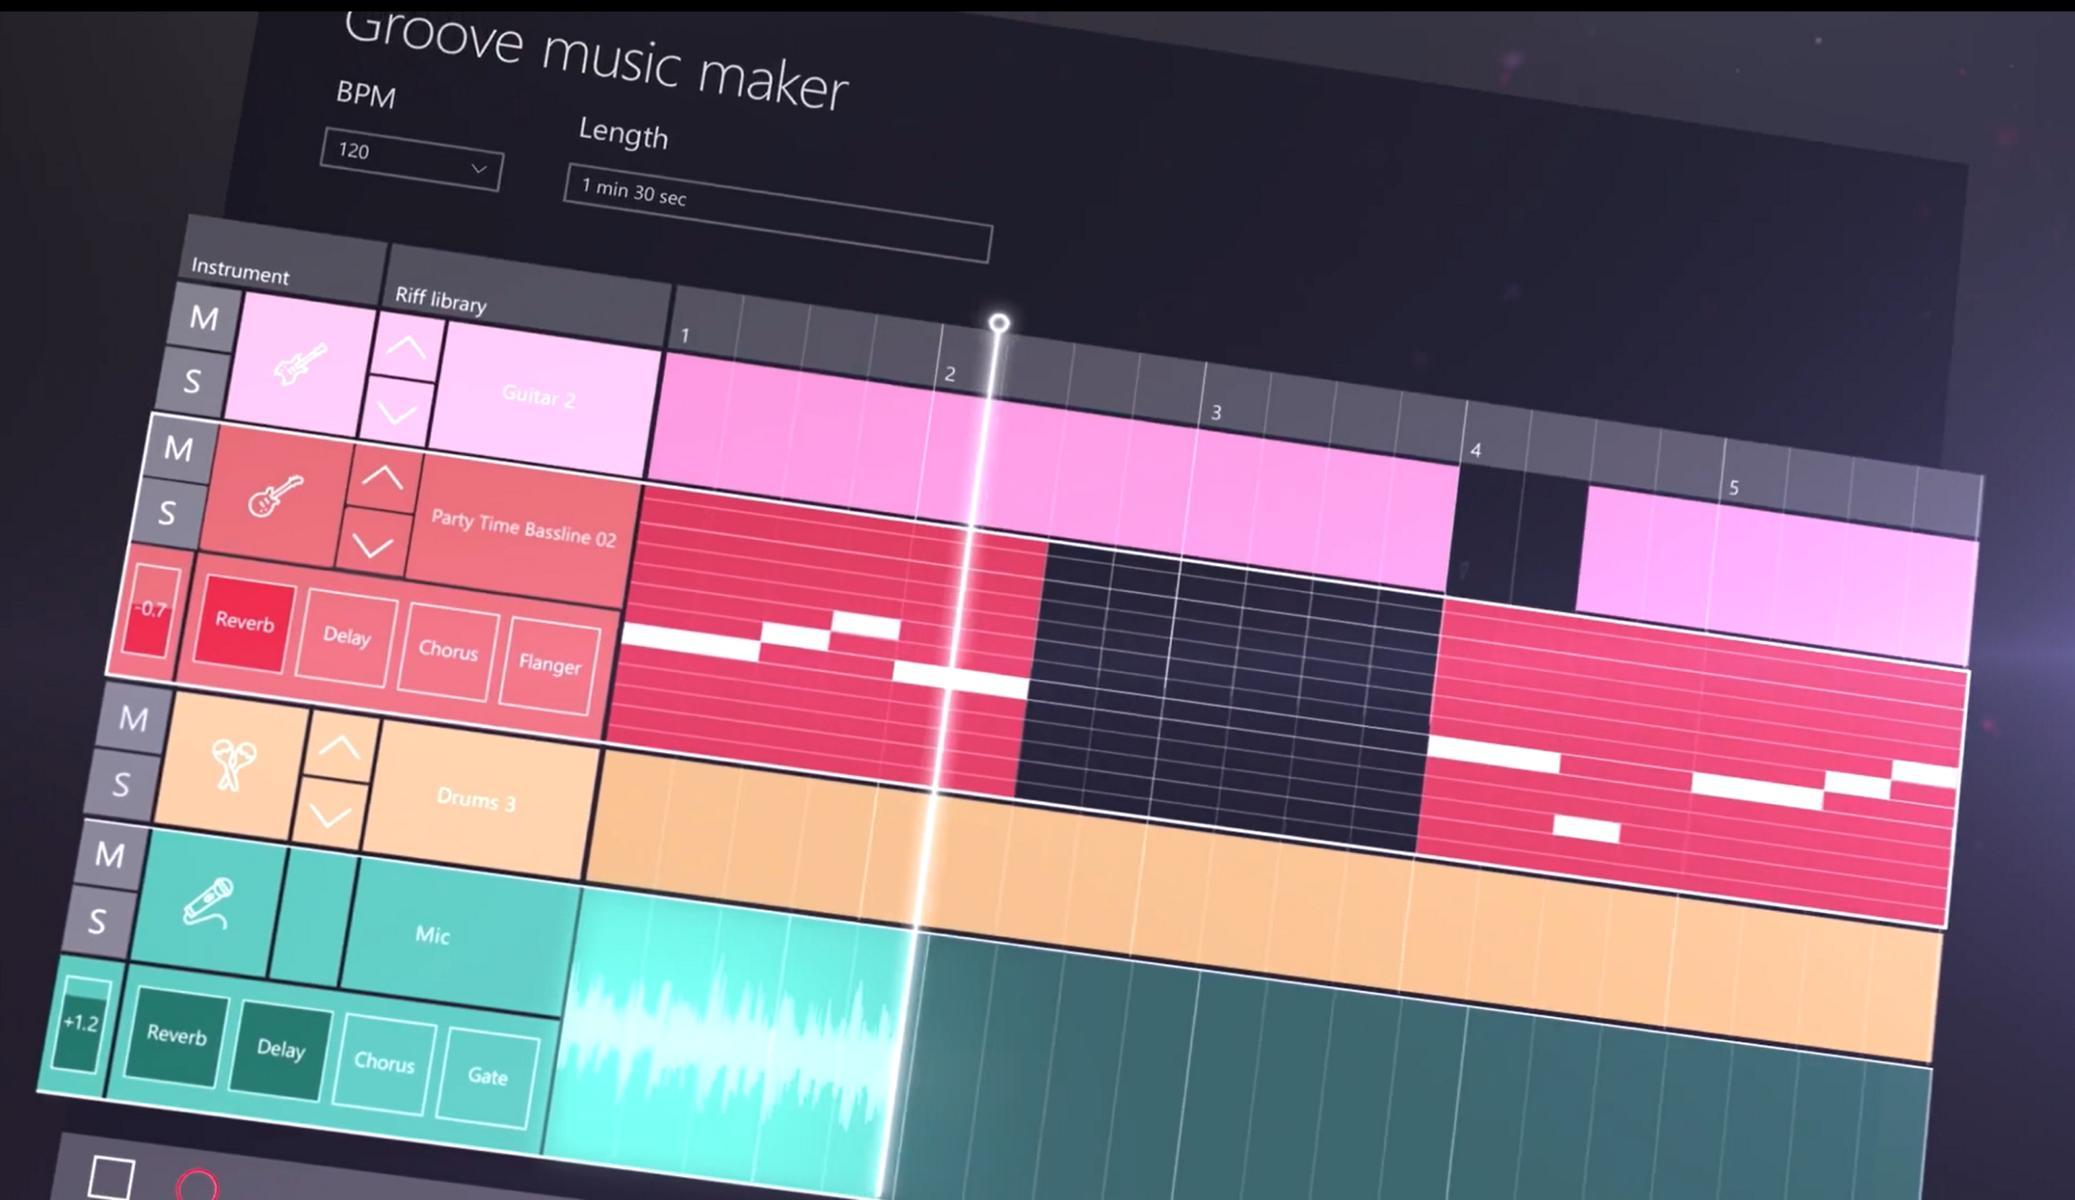 groove-music-maker